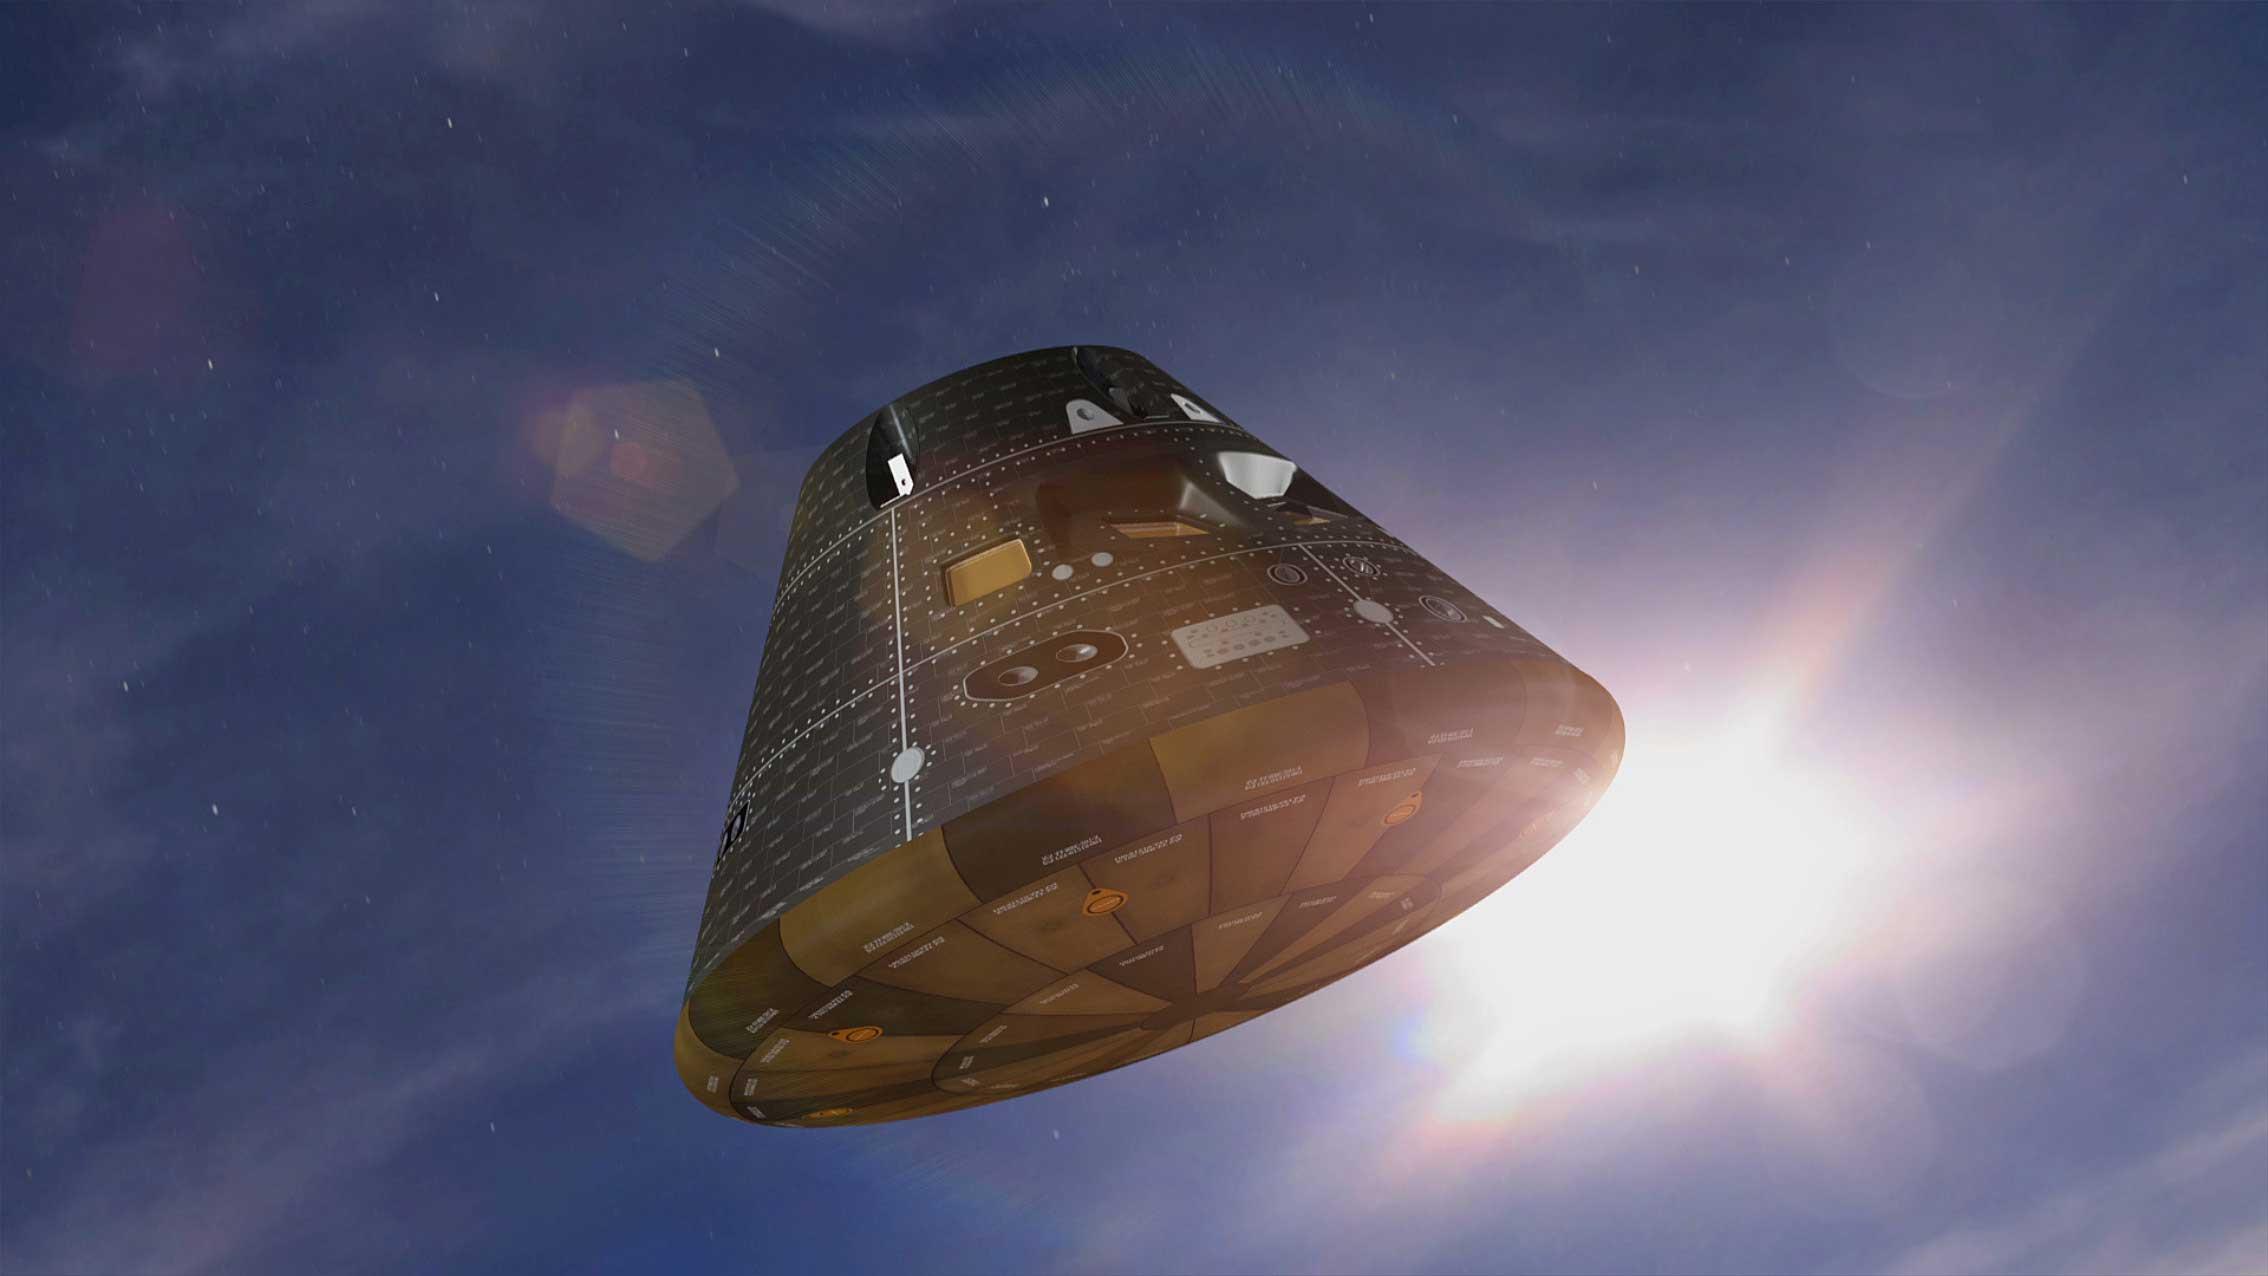 An artist's illustration of Orion's Flight Test